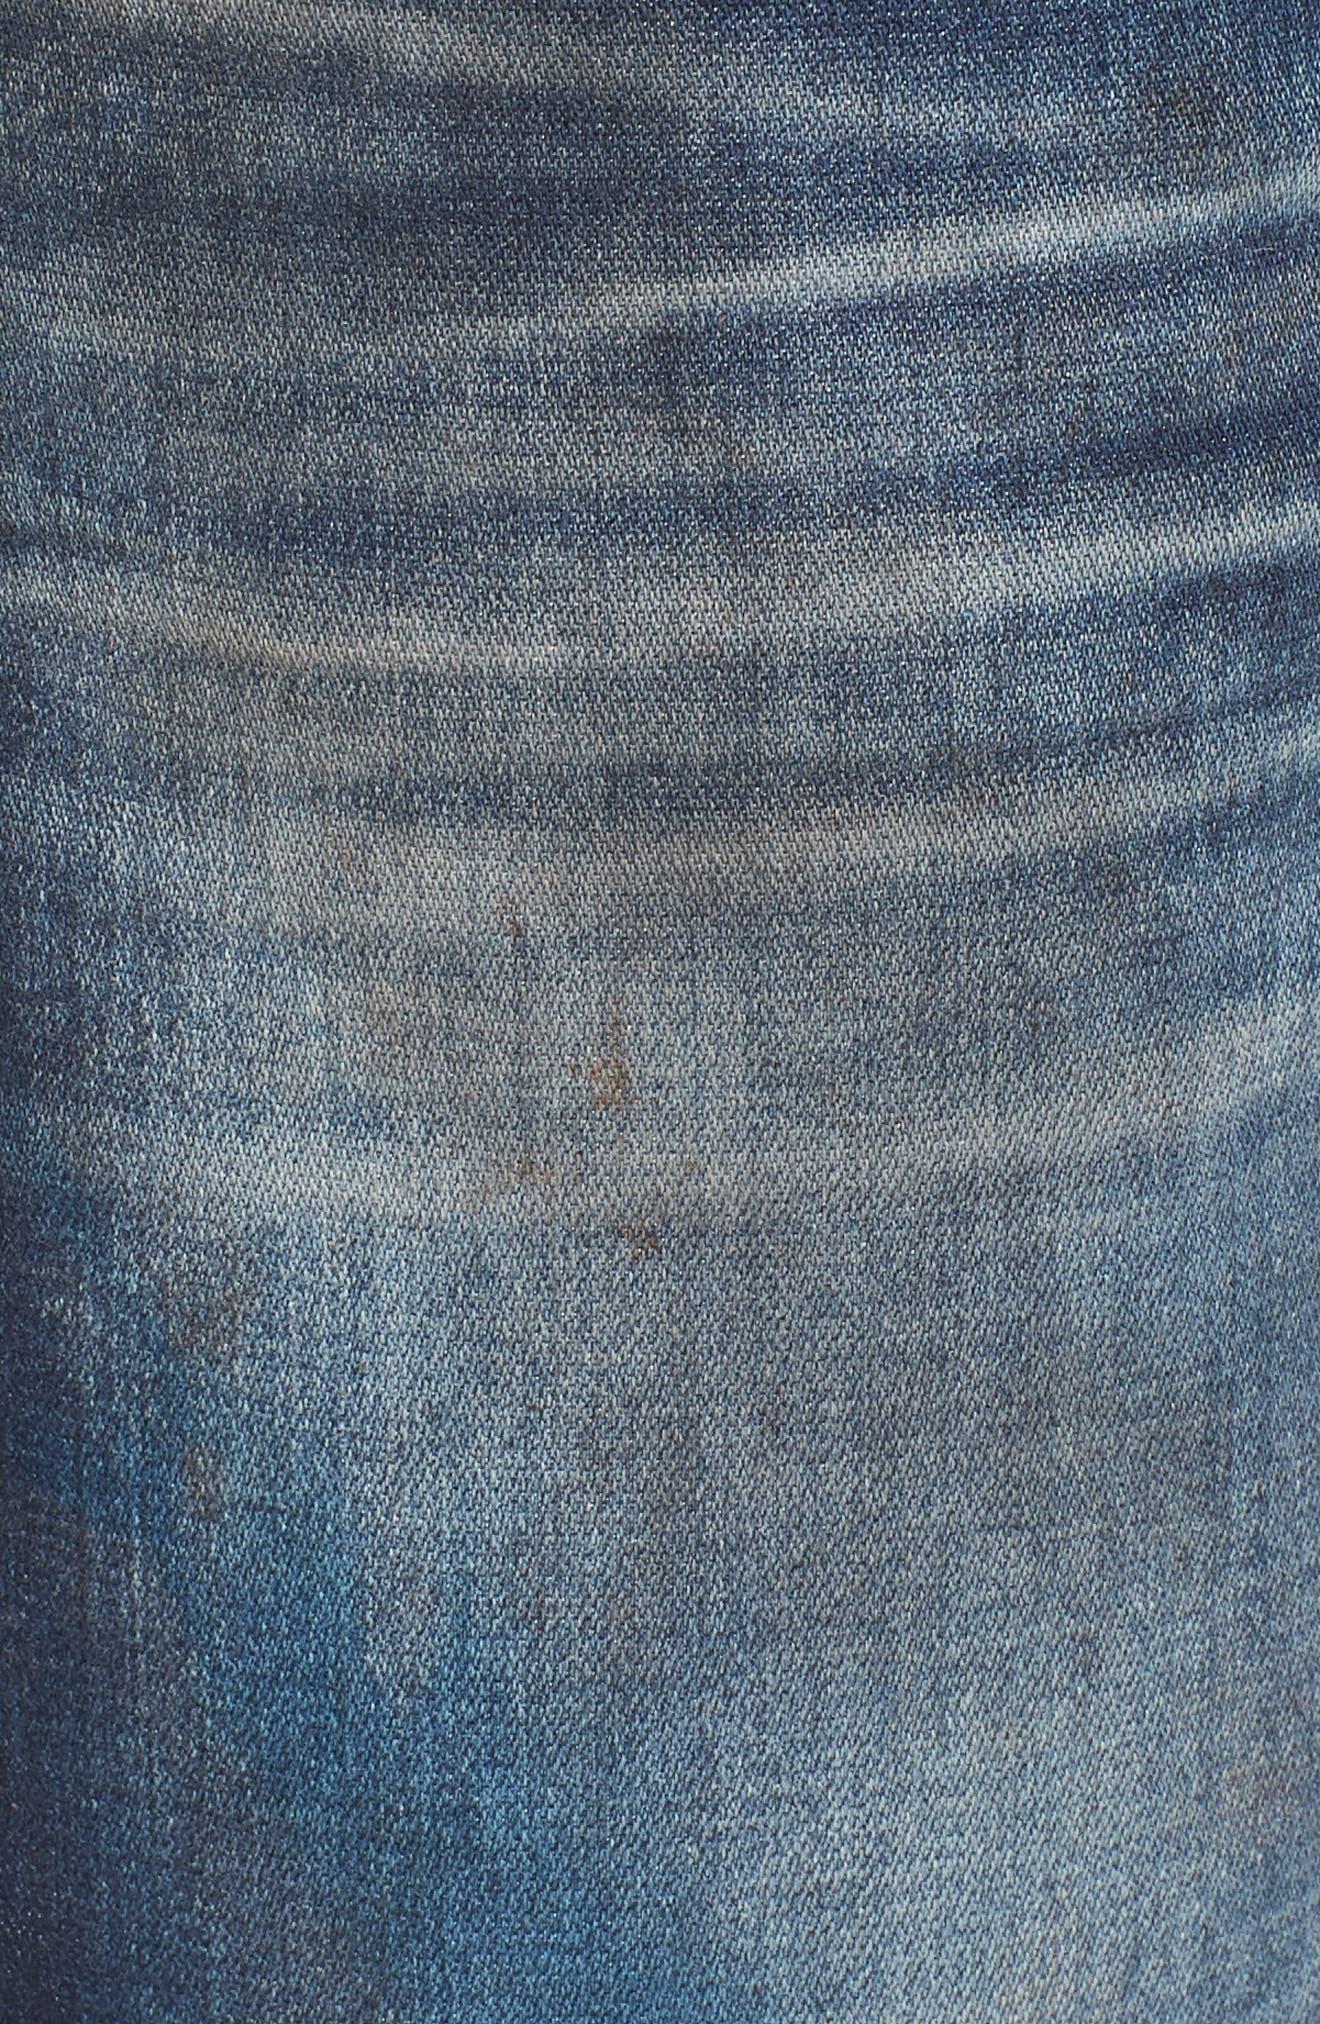 Rocco Skinny Fit Jeans,                             Alternate thumbnail 5, color,                             Loft Edge